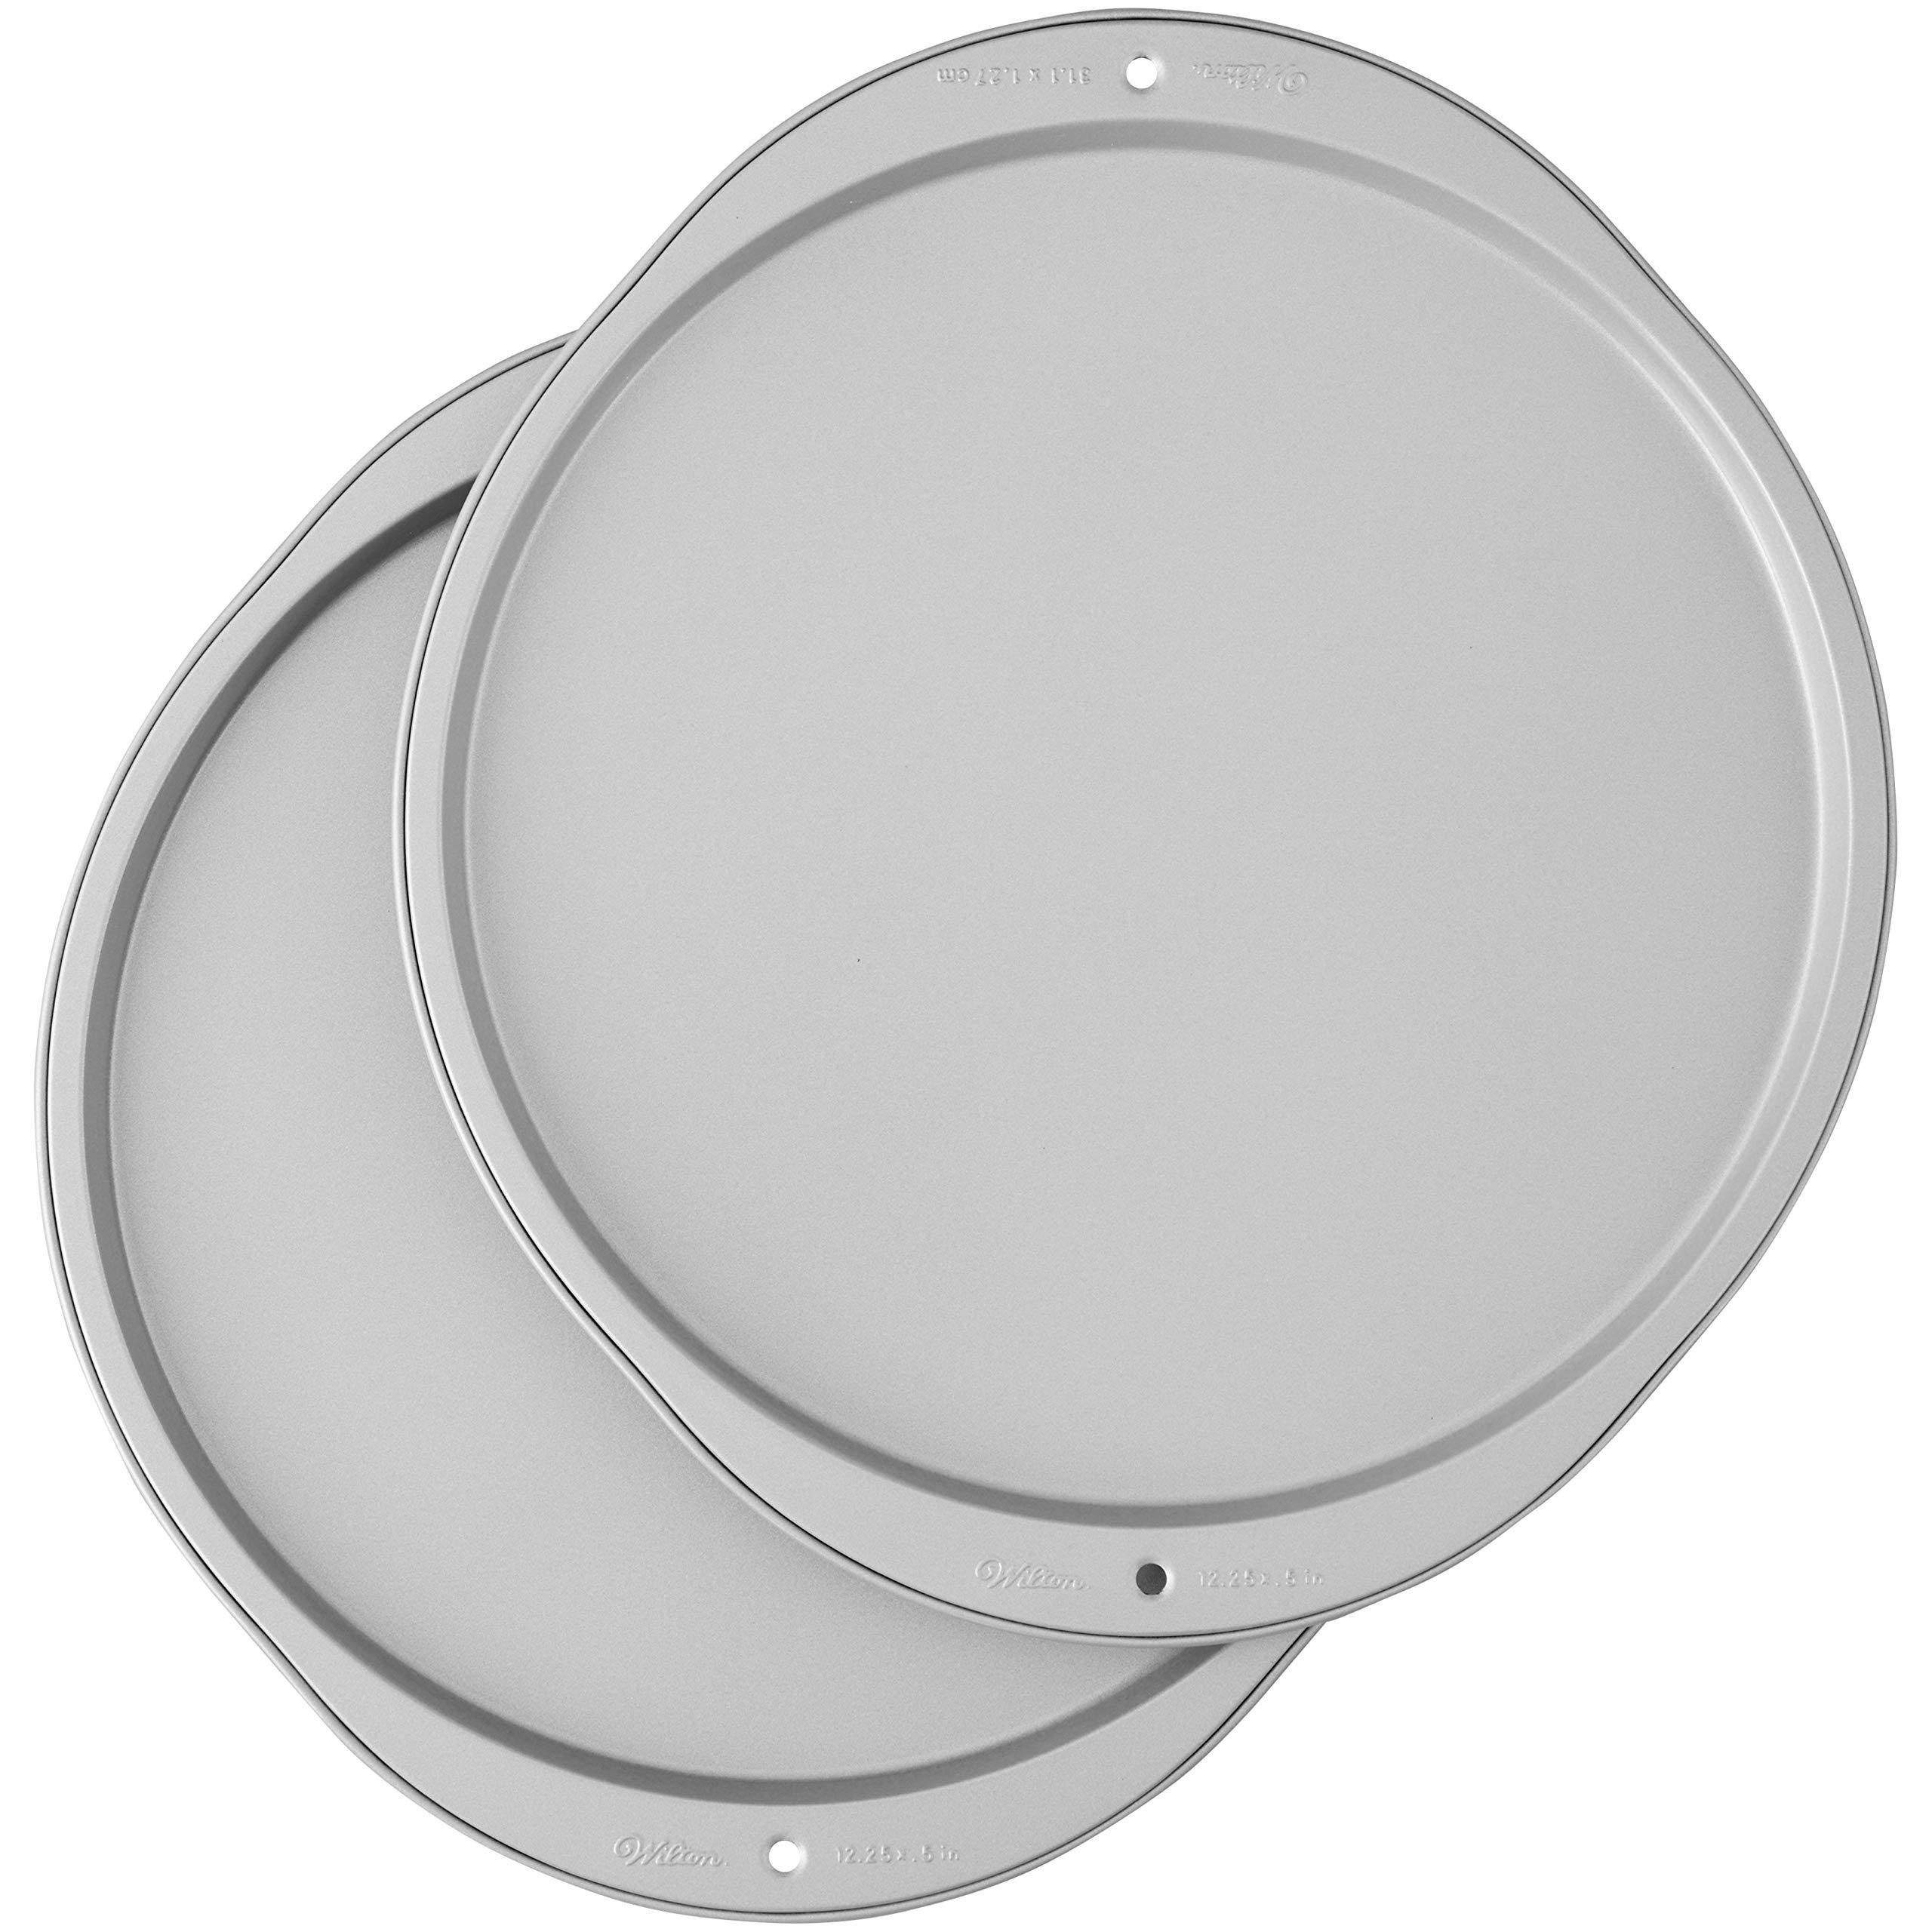 Wilton Recipe Right Pizza Pans,  2-Piece Set by Wilton (Image #1)